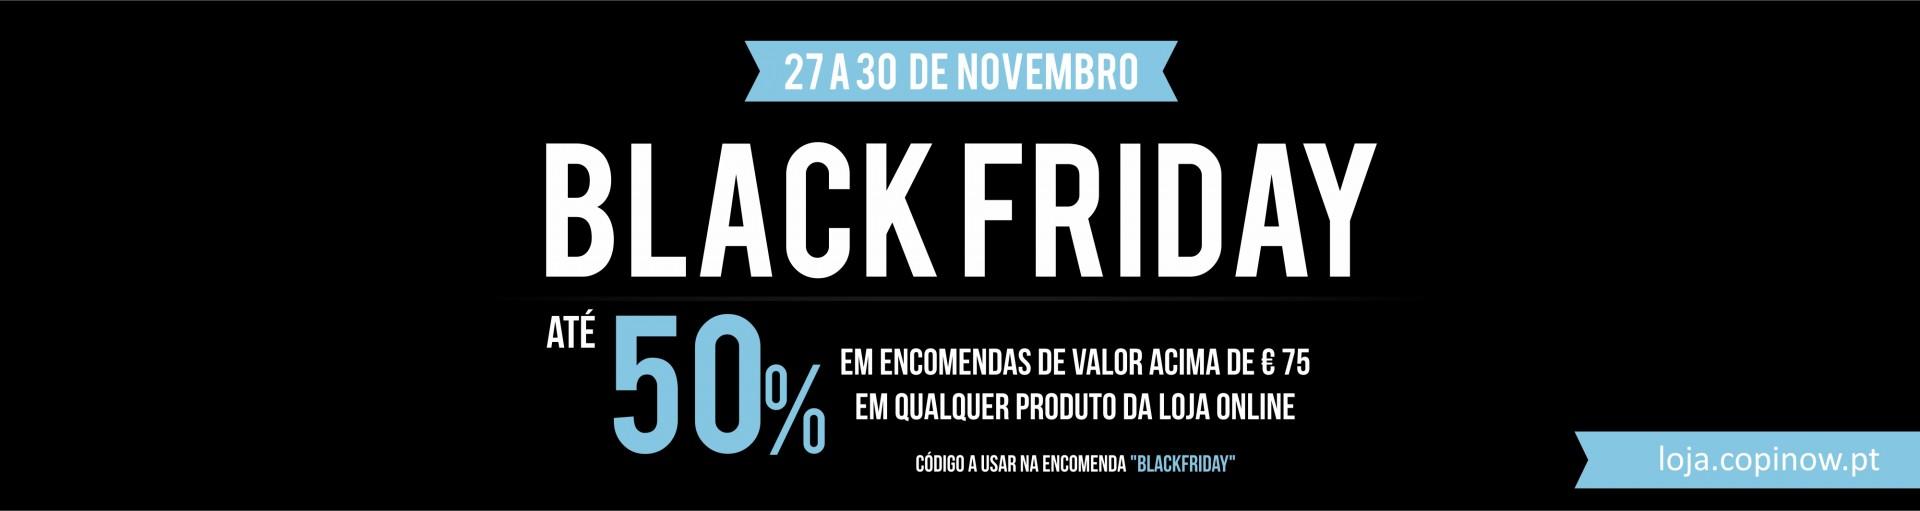 Campanha Blackfriday: 50% de desconto